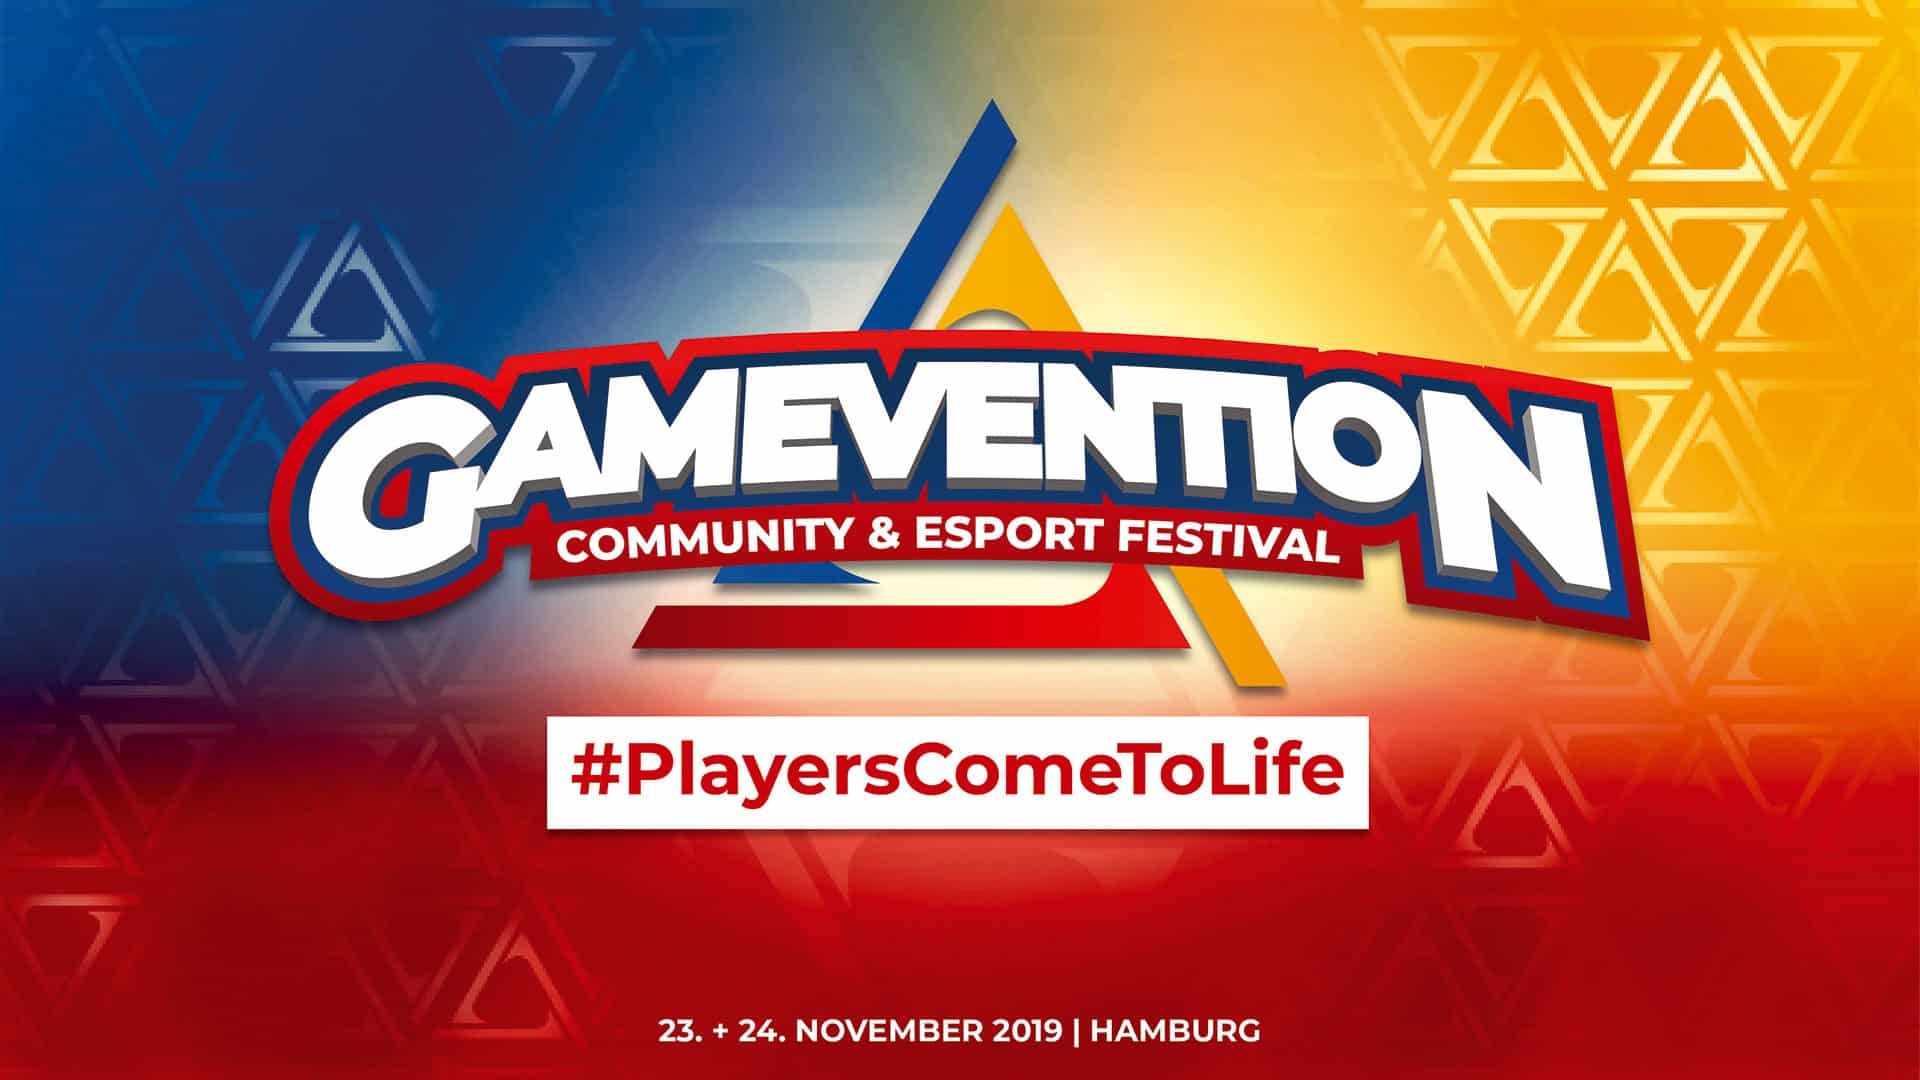 GAMEVENTION 2019 Logo babt